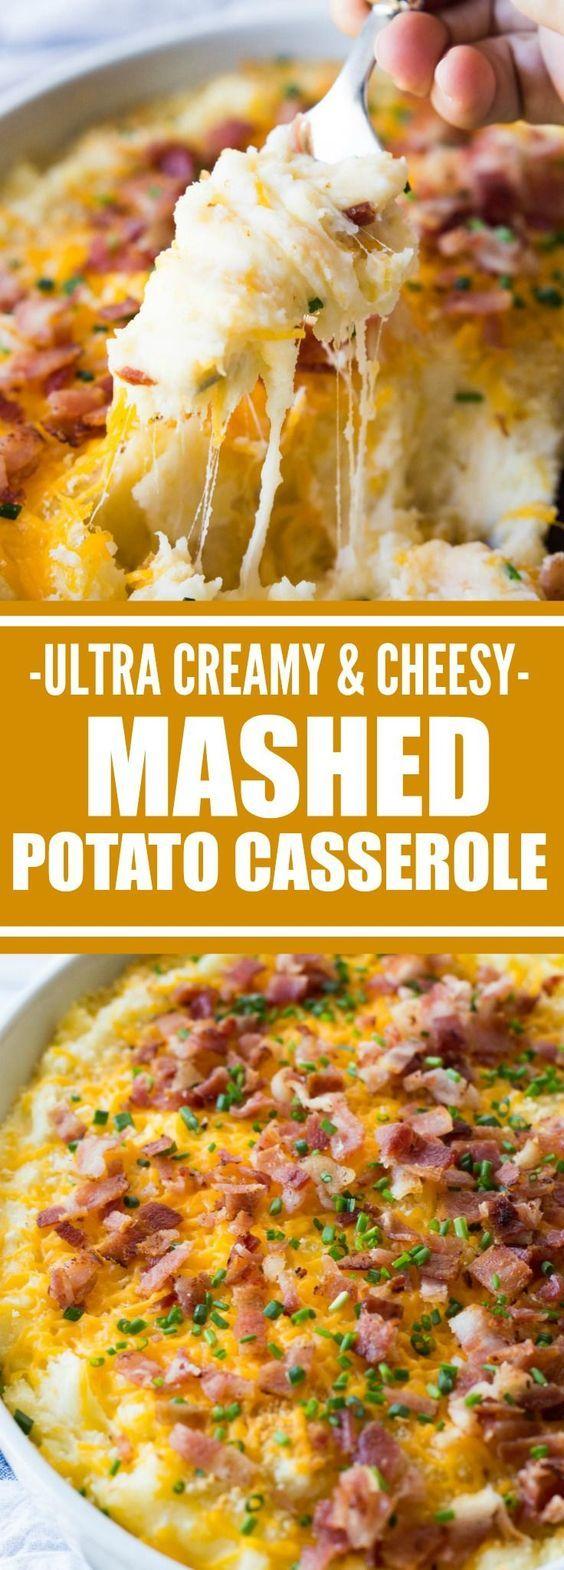 The 25 Best Make Ahead Scalloped Potatoes Ideas On Pinterest Best Breakfast Casserole Good Breakfast Foods And Scalloped Potatoes Easy